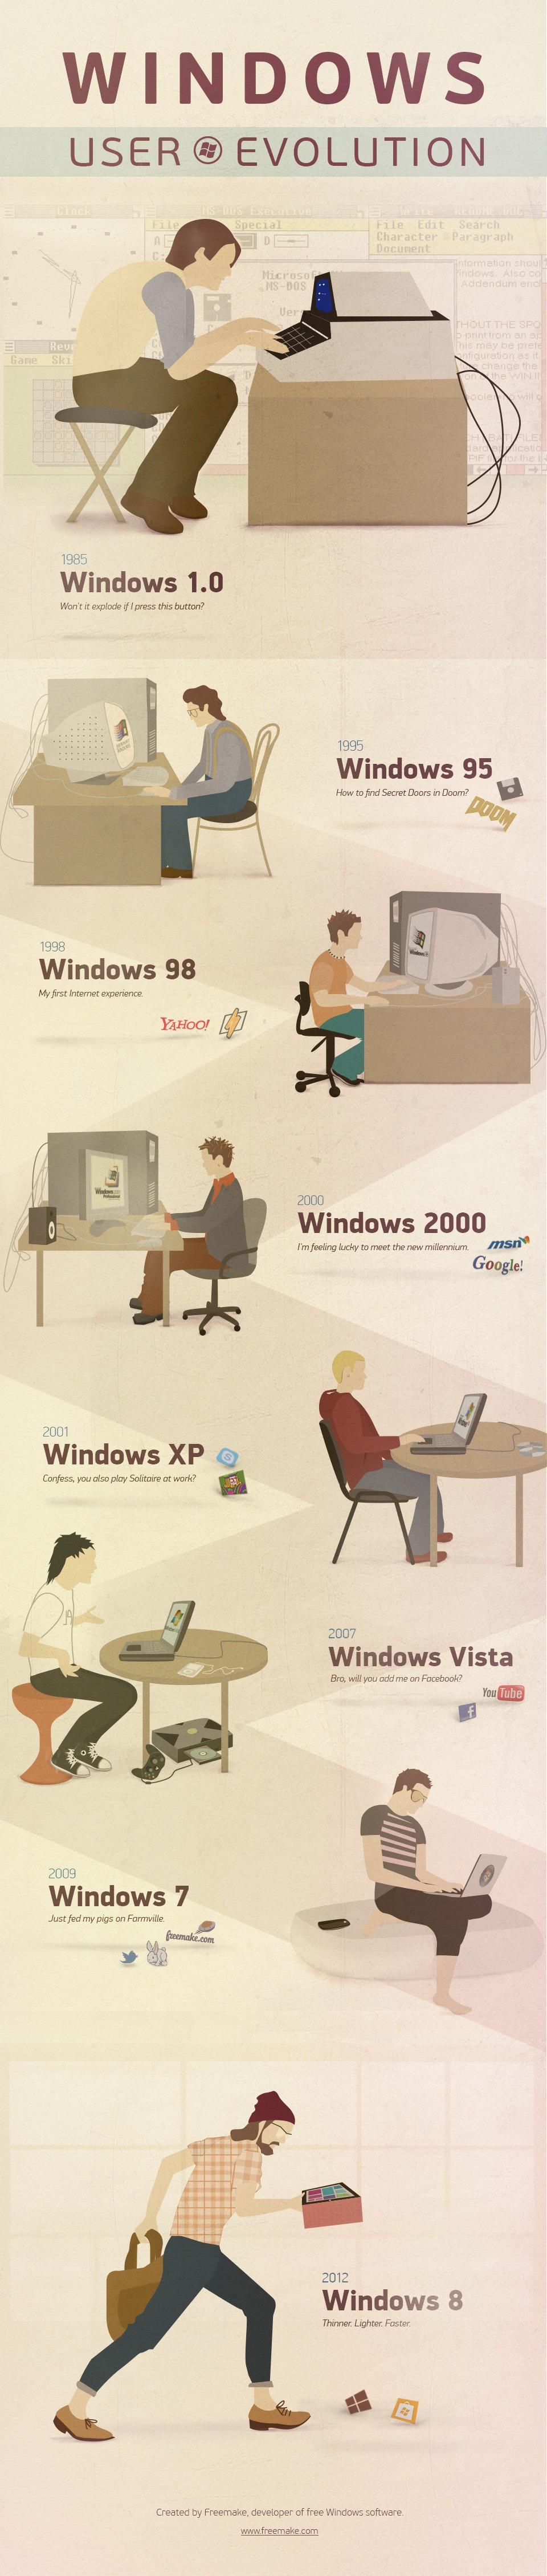 Windows Nutzer Evolution Infografik